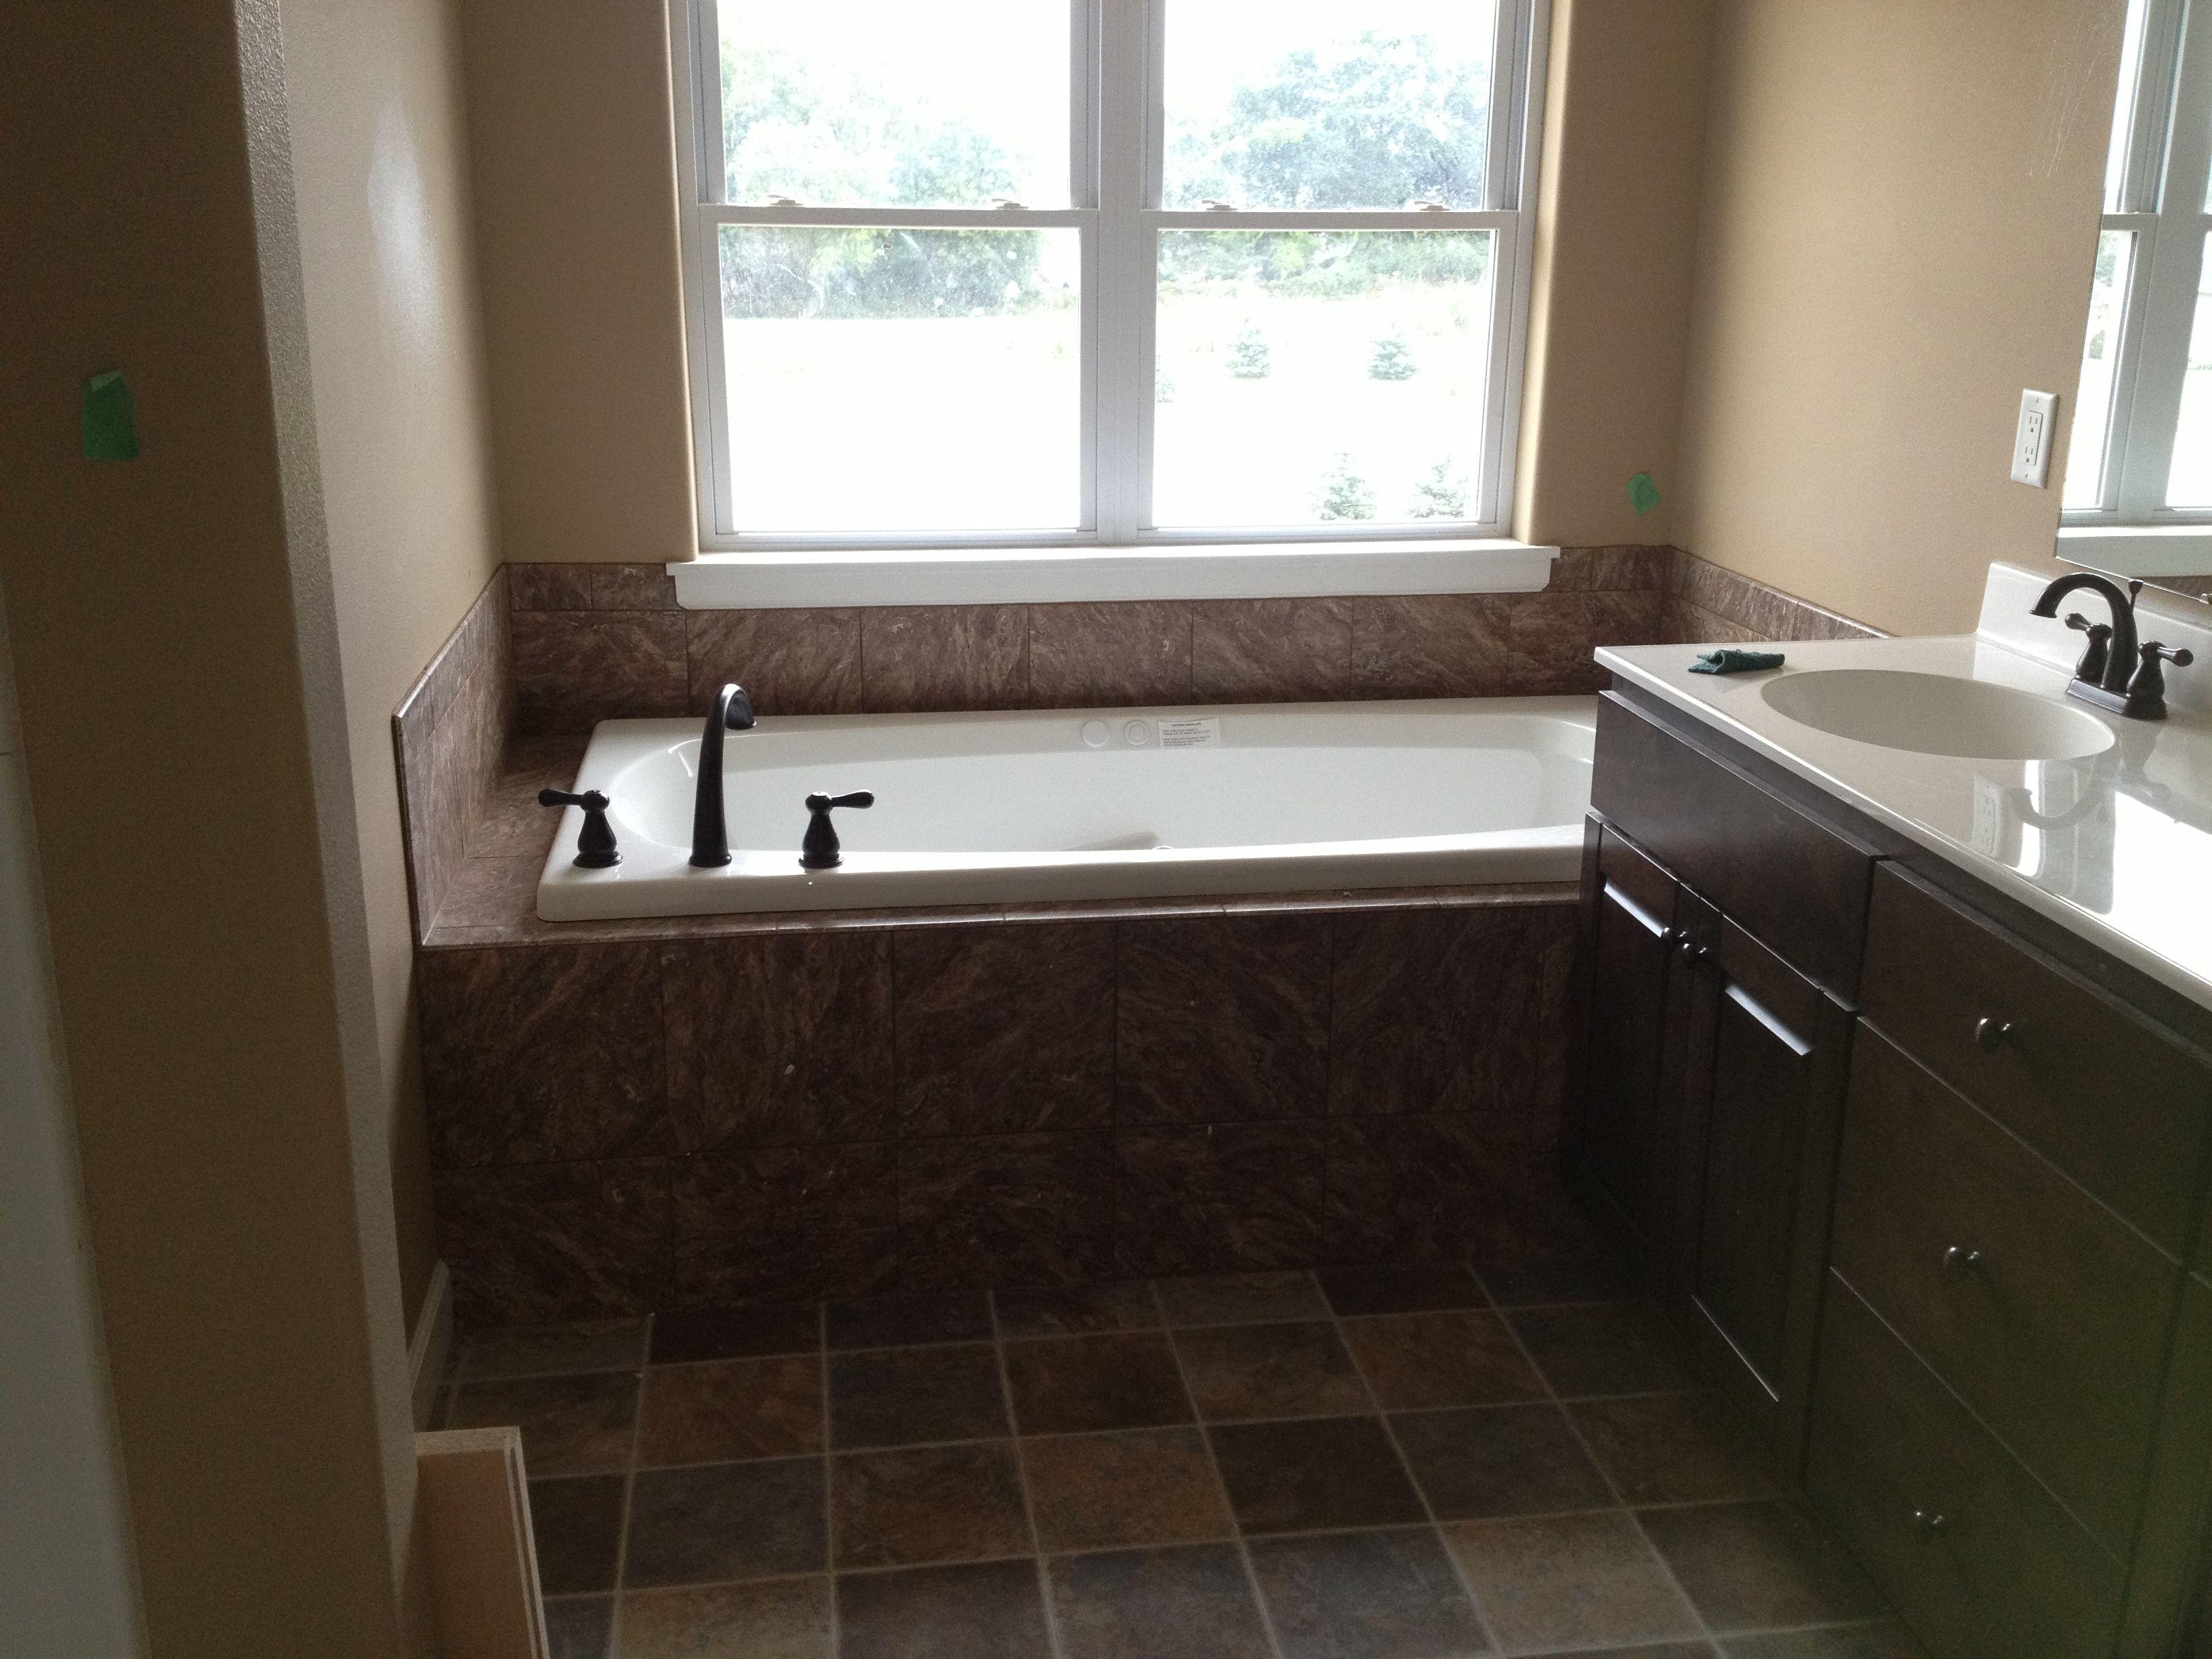 Master Bath Tiled Tub Front Decking And Splash Guard With - Splash guard for bathroom sink for bathroom decor ideas